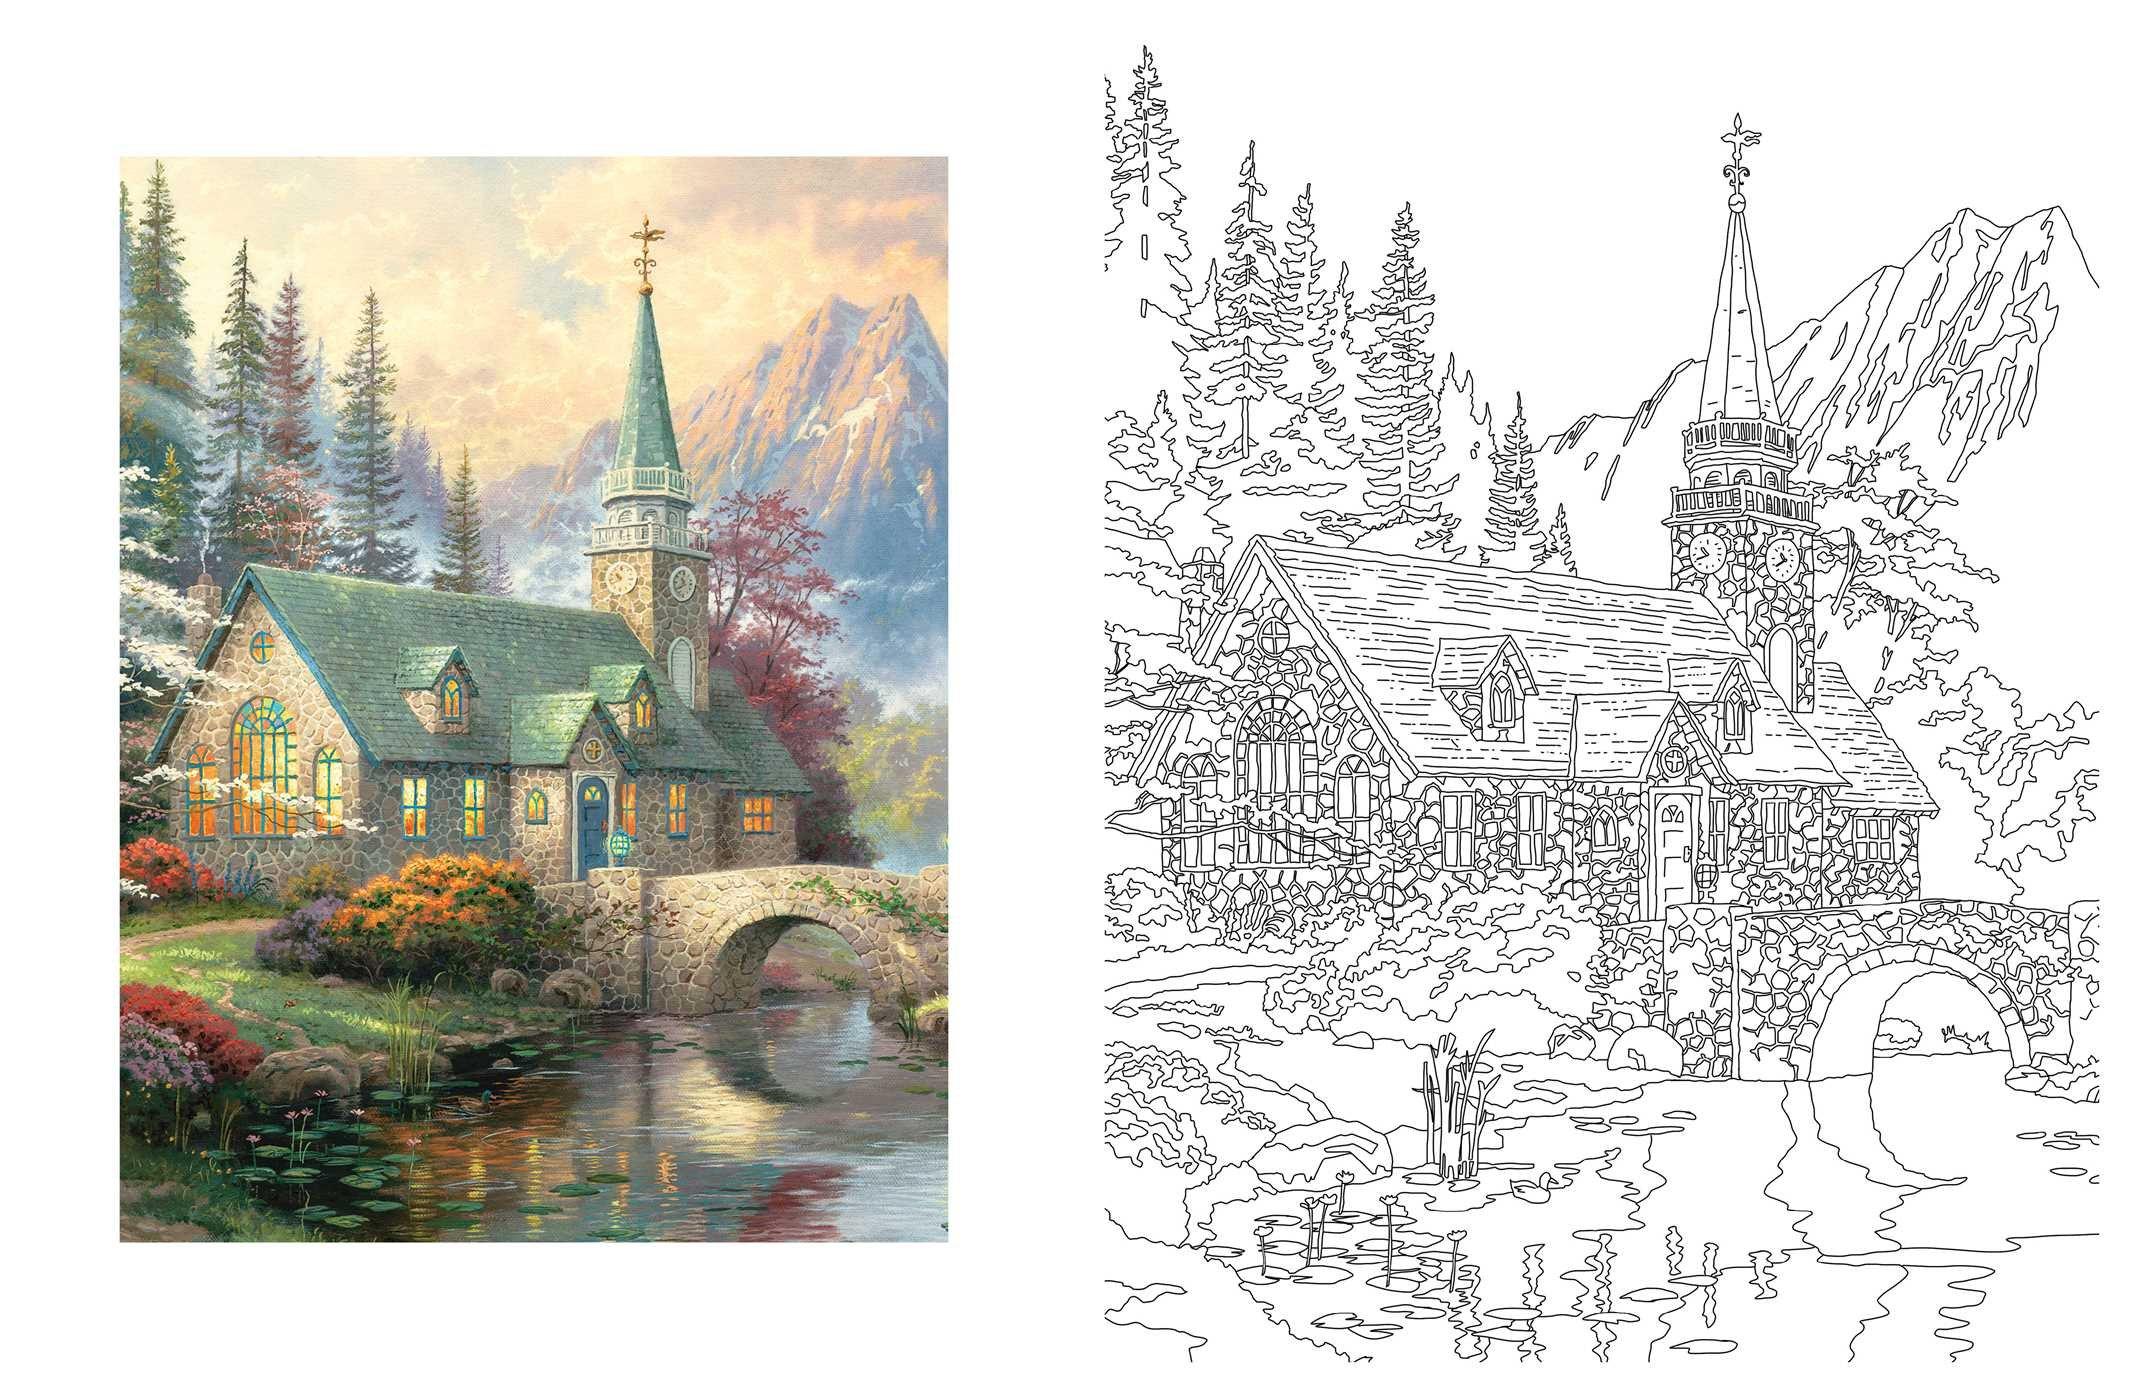 Thomas Kinkade Coloring Pages Free